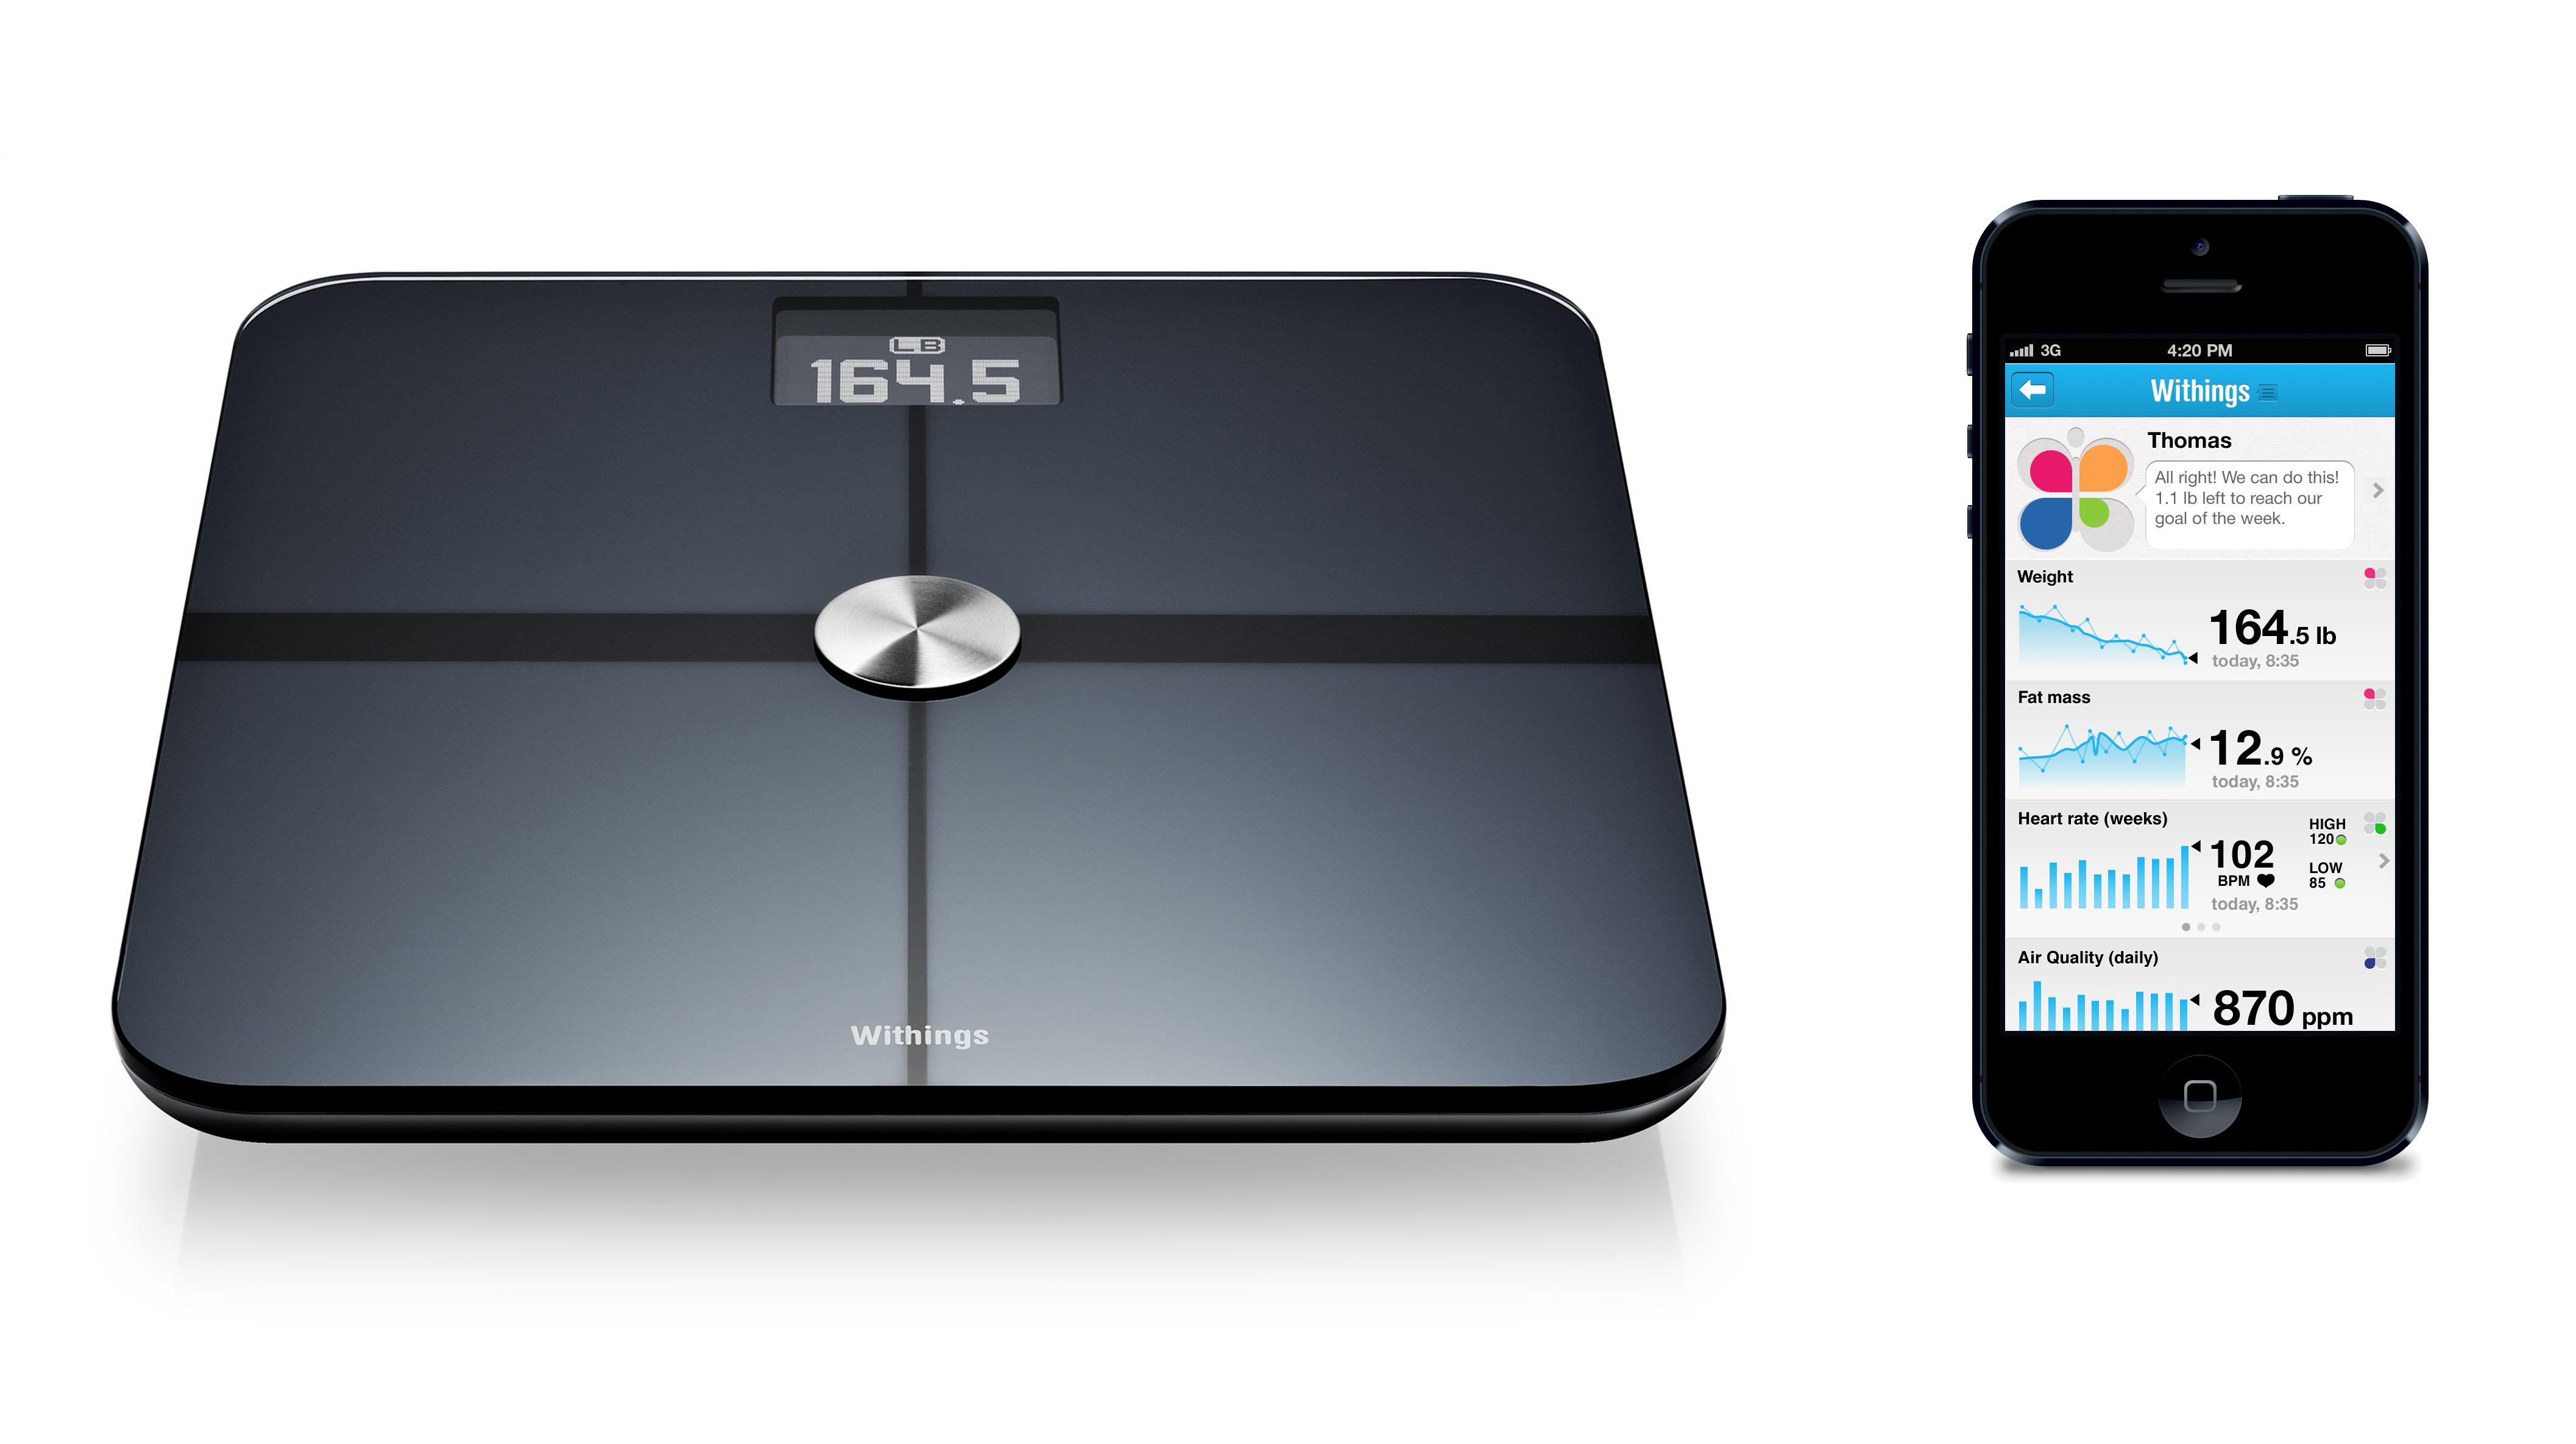 withings smart body analyzer jpg